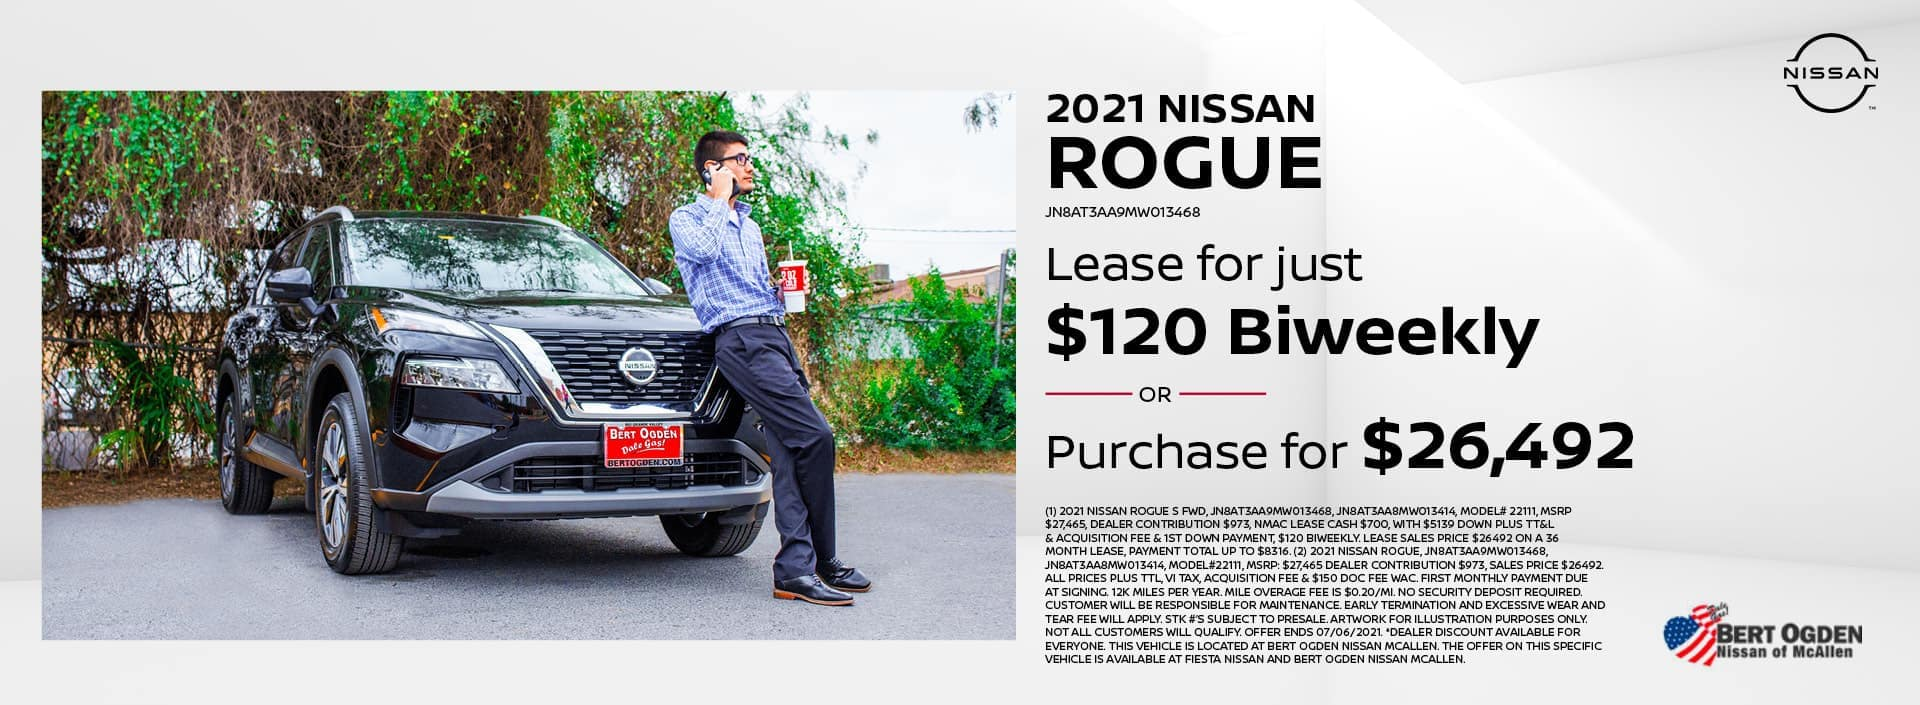 BO-Nissan-Specials-Biweekly-1920X705-2021ROGUE-1